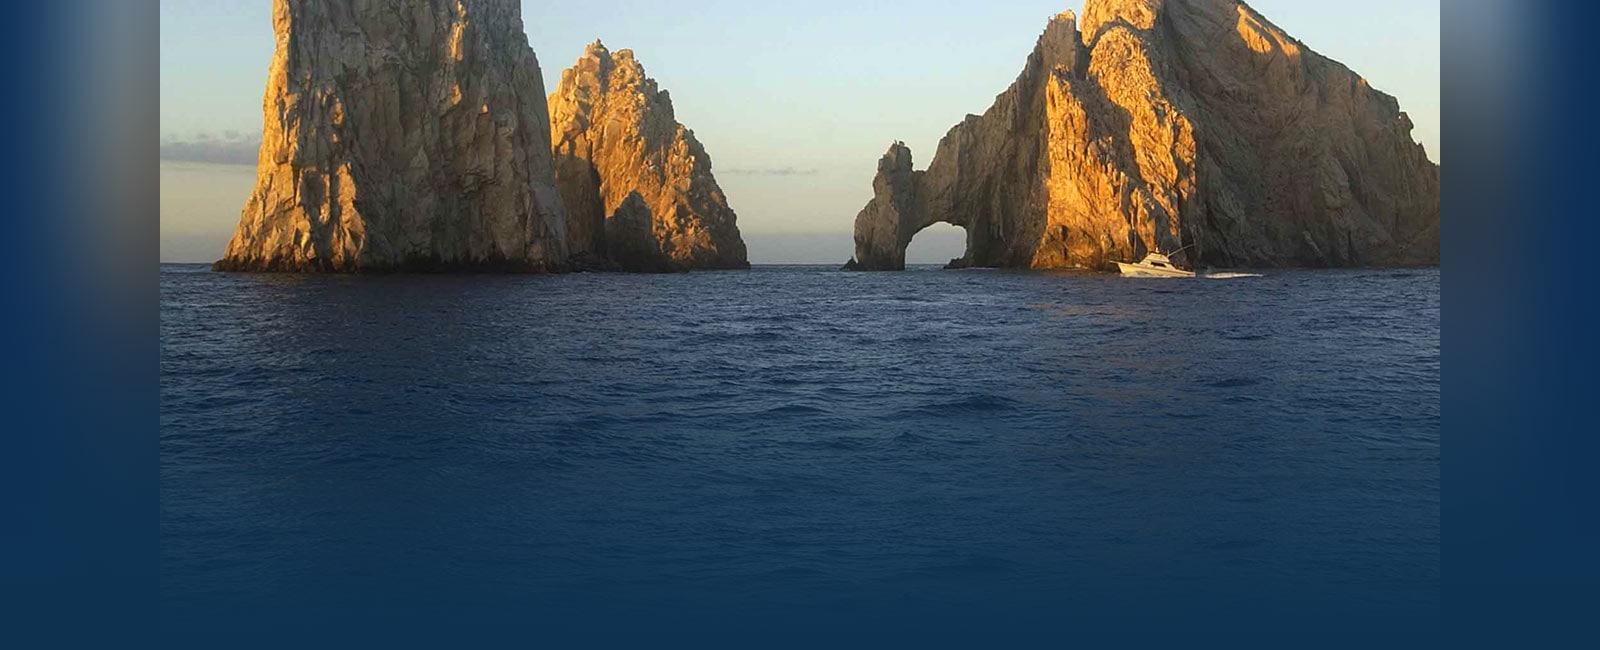 Cruises To Mexico Mexico Cruises Princess Cruises